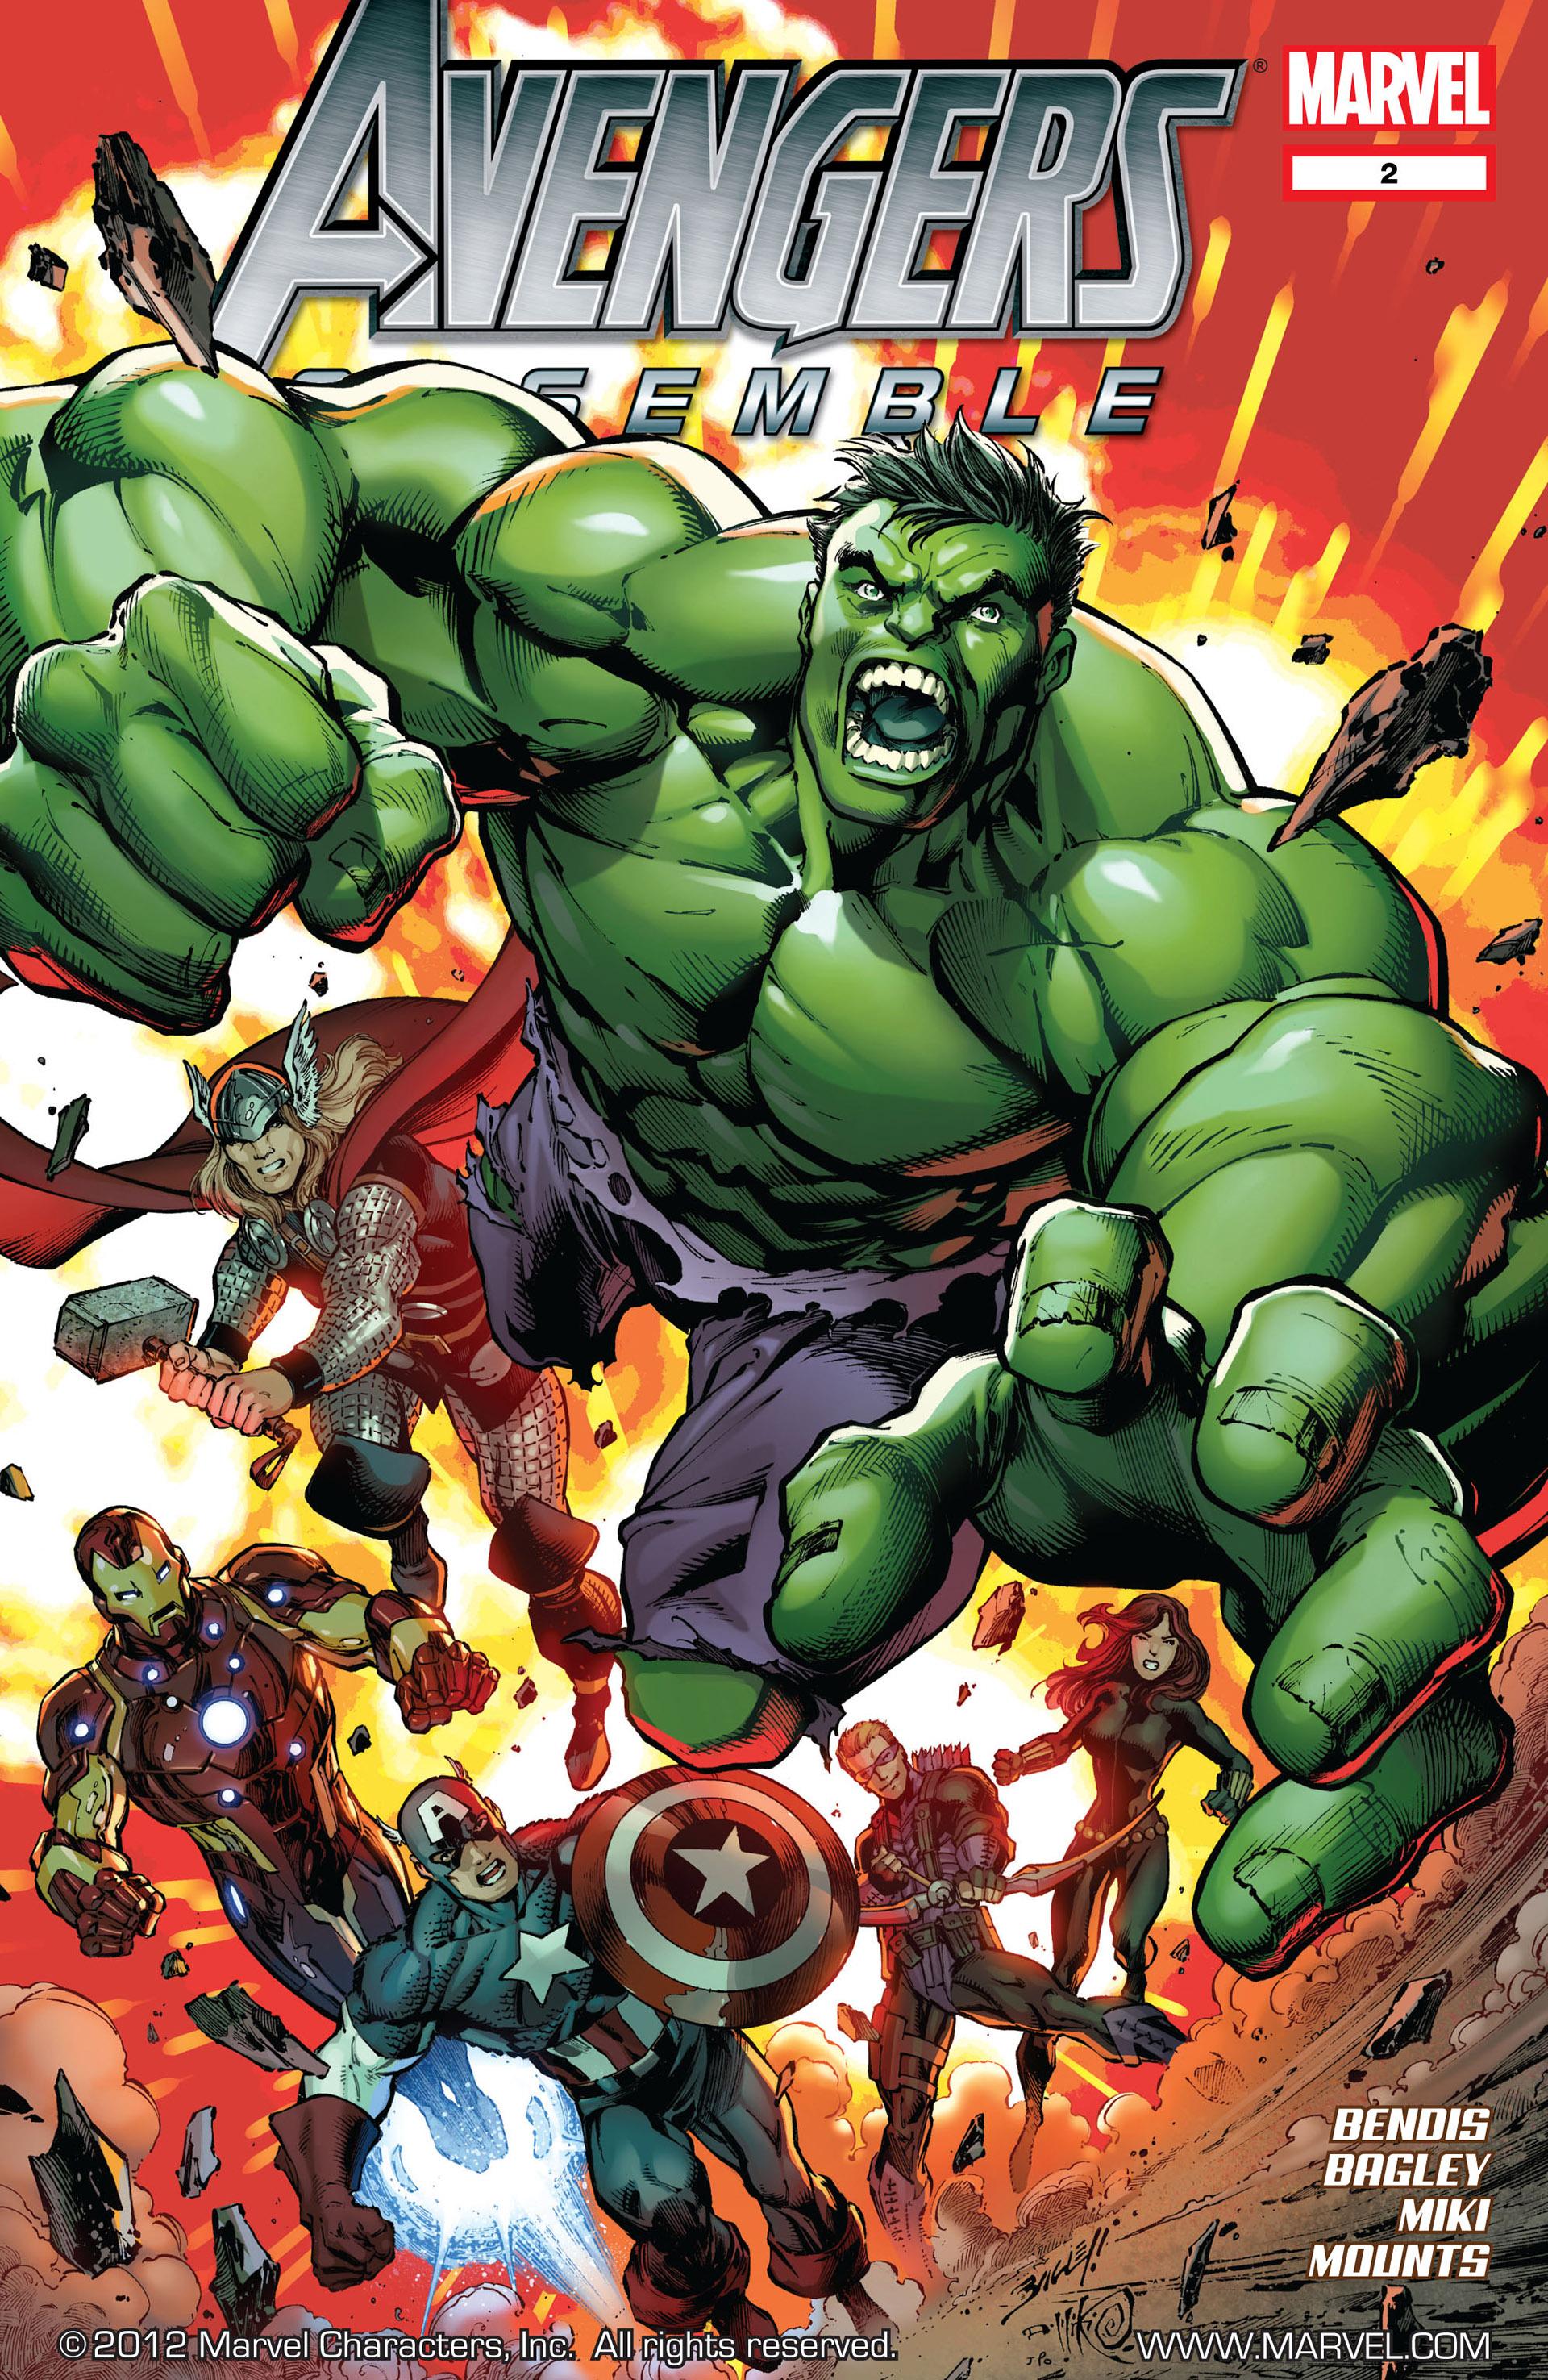 Avengers Assemble (2012) 2 Page 1